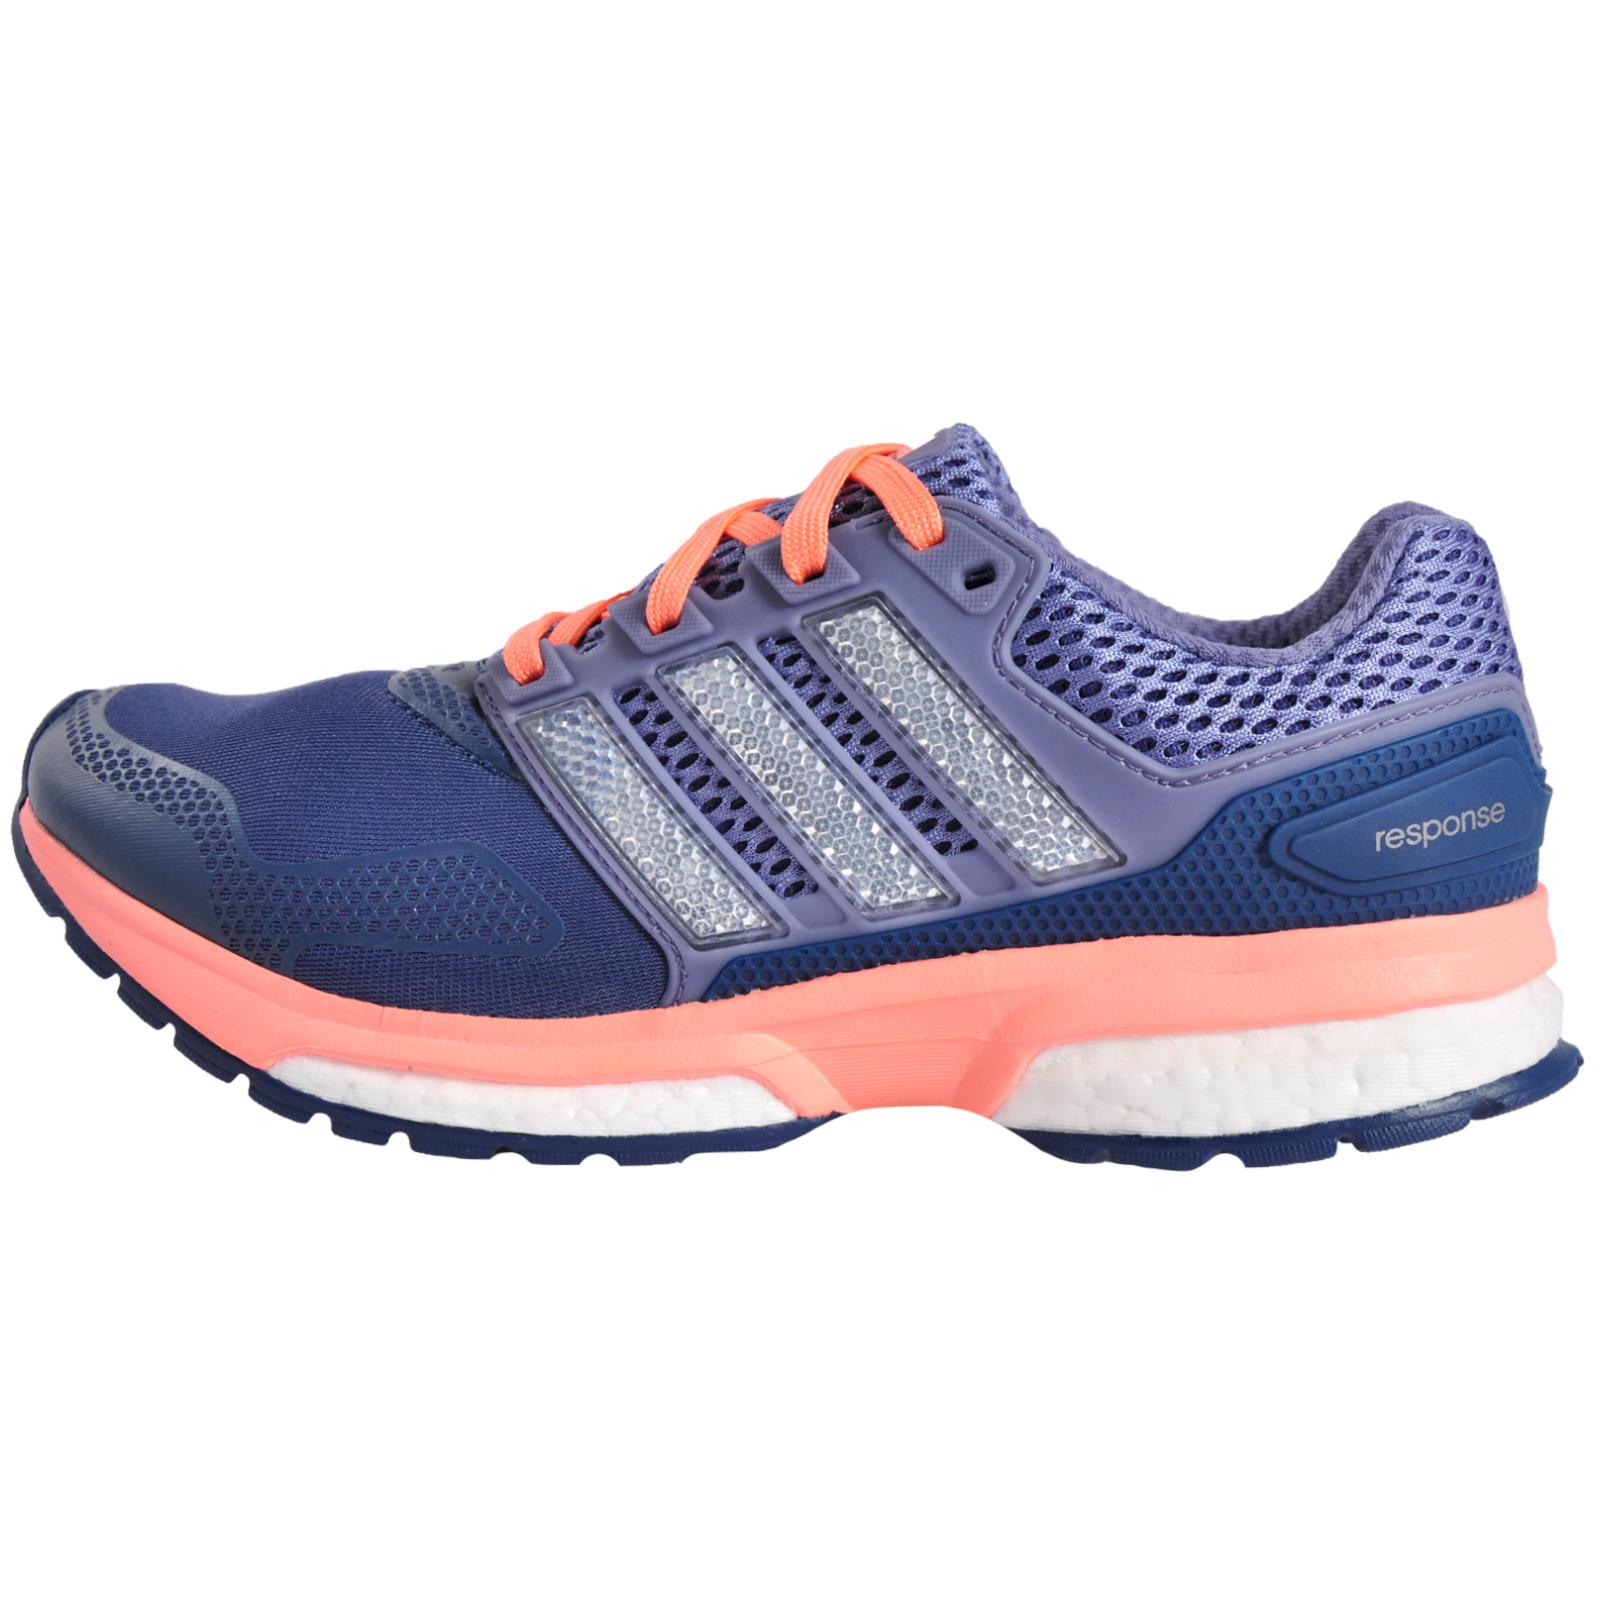 Adidas Response Boost 2 Techfit Womens